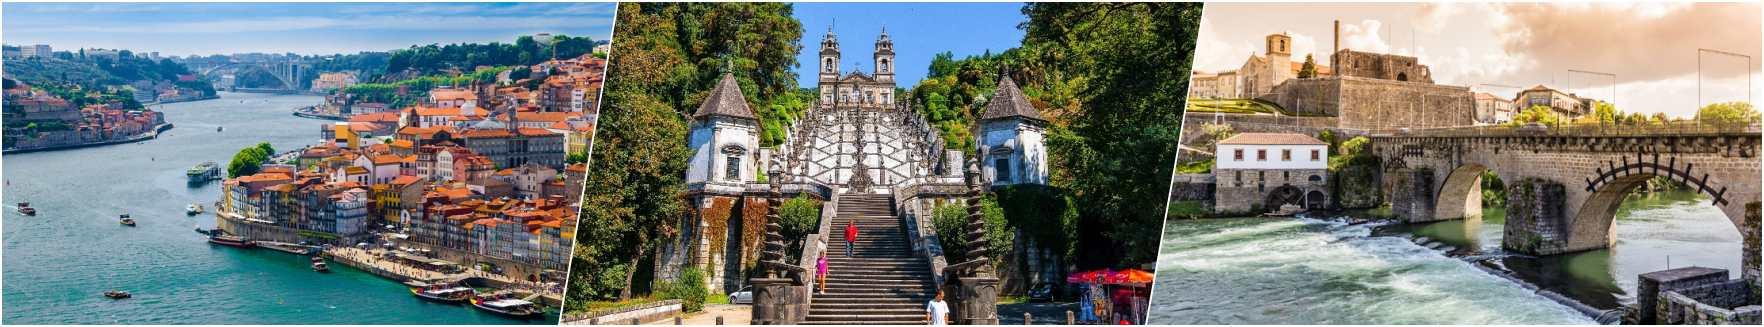 Porto - Braga - Minho